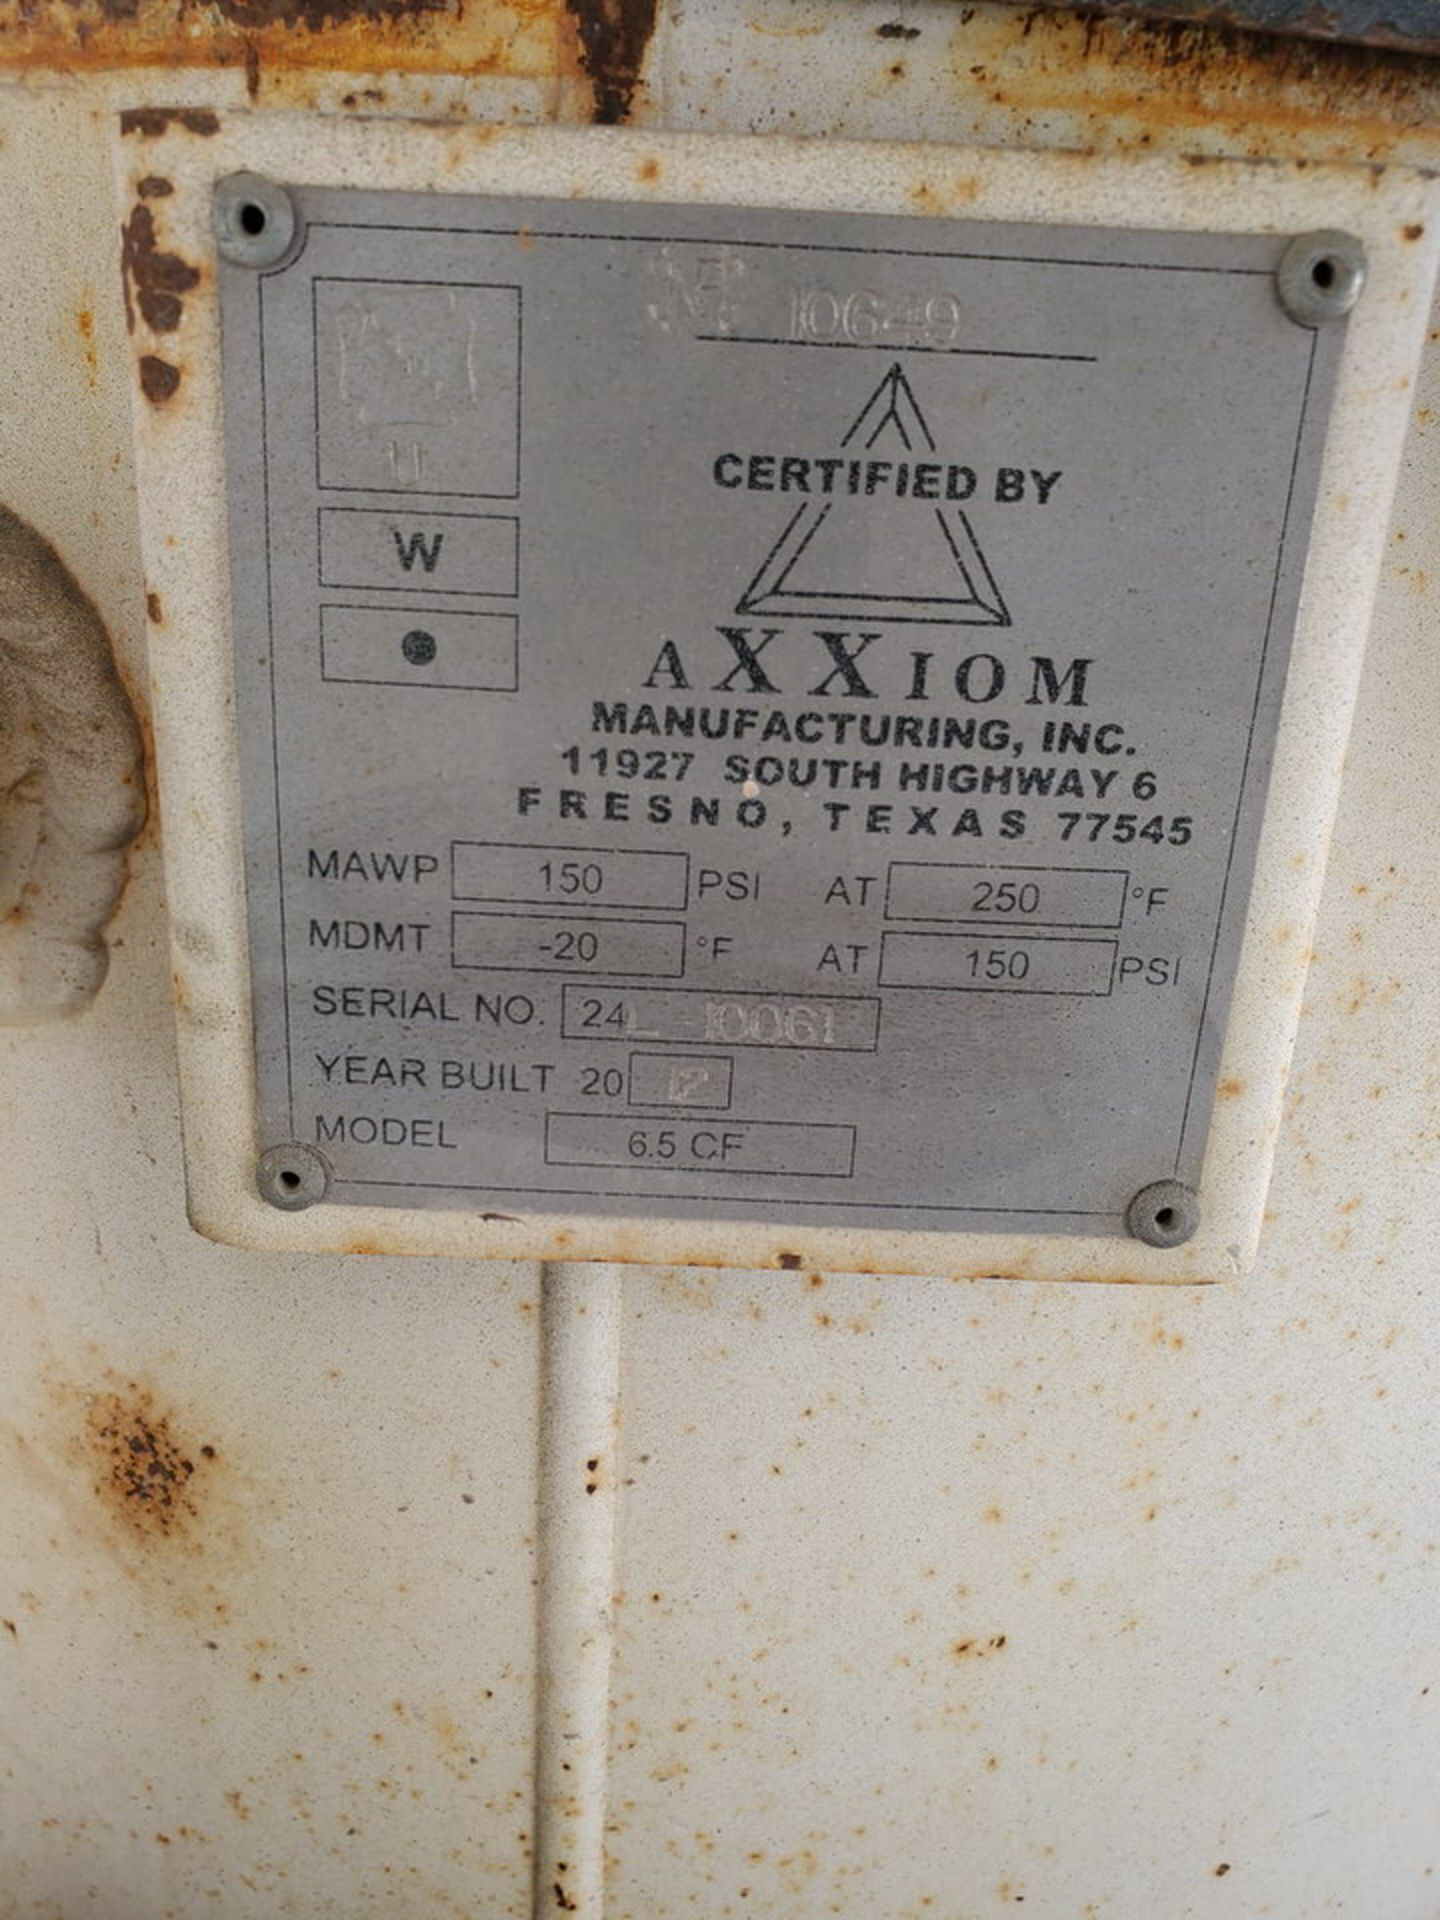 Schmidt 12' Portable Abrasive Sand Blaster Pot 150psi@250F, -20F@150psi; NB# 10649 - Image 9 of 9